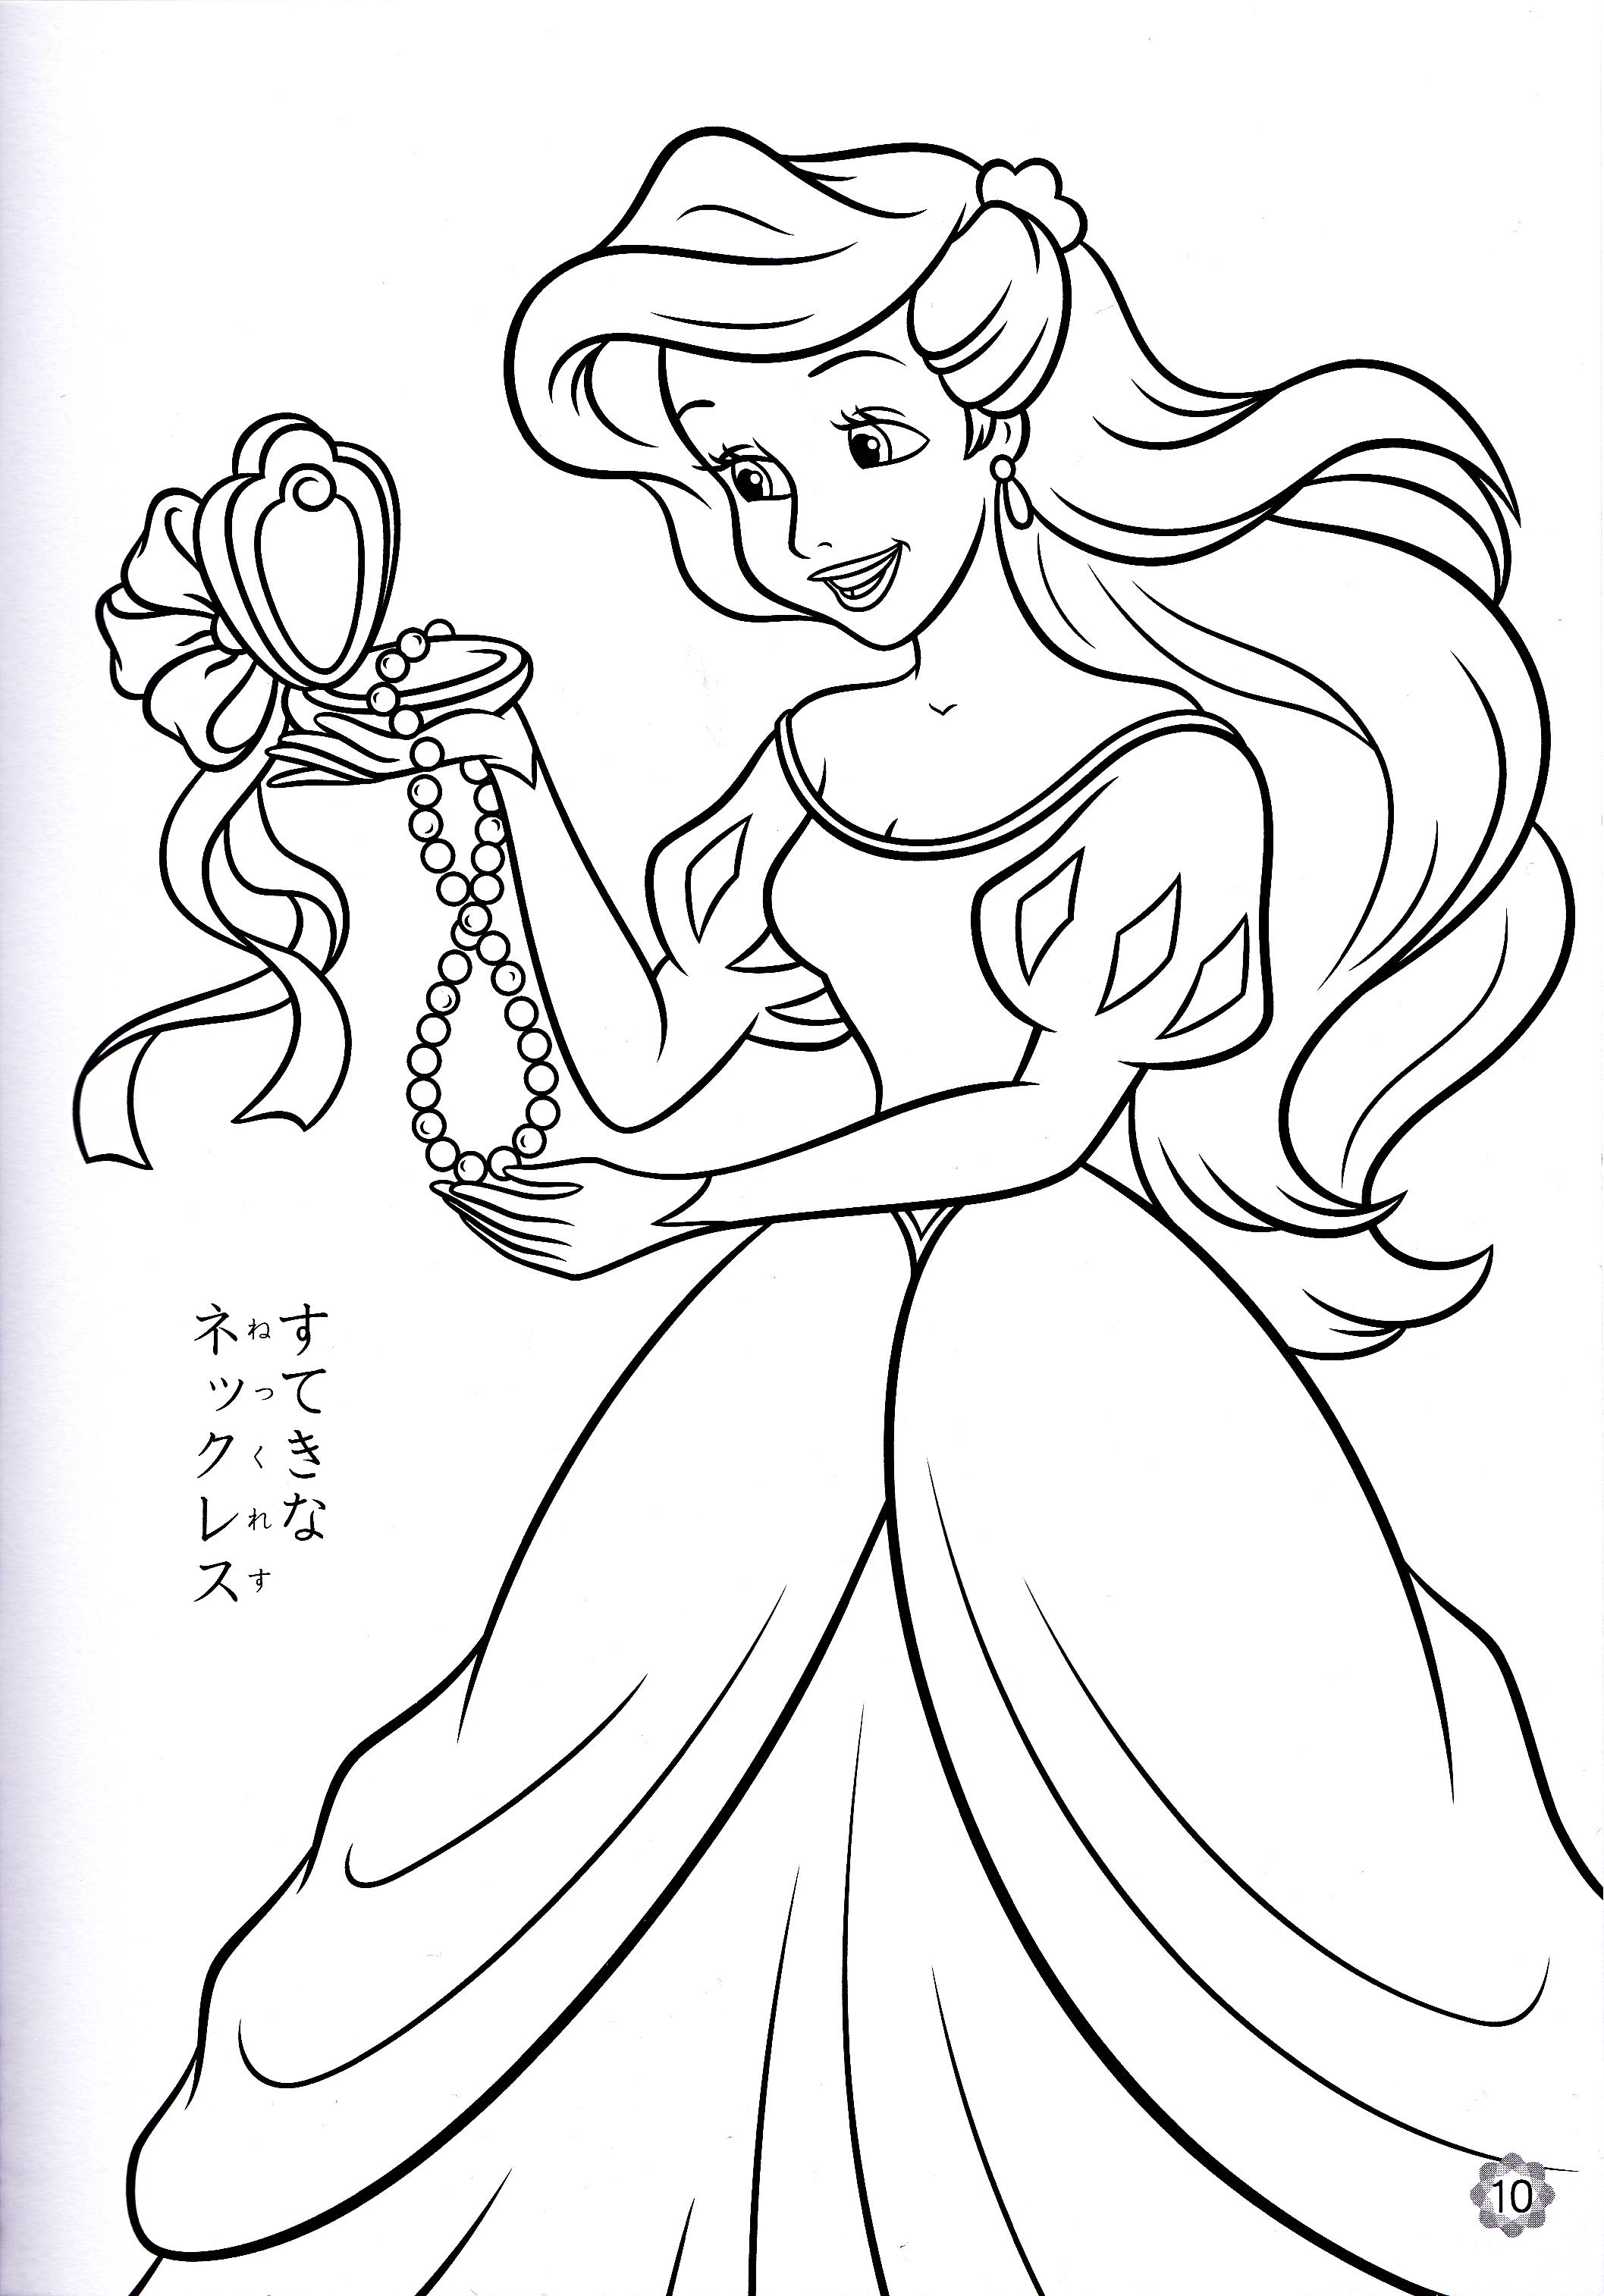 Walt Disney Coloring Pages - Princess Ariel - Walt Disney ... | free printable coloring pages disney ariel